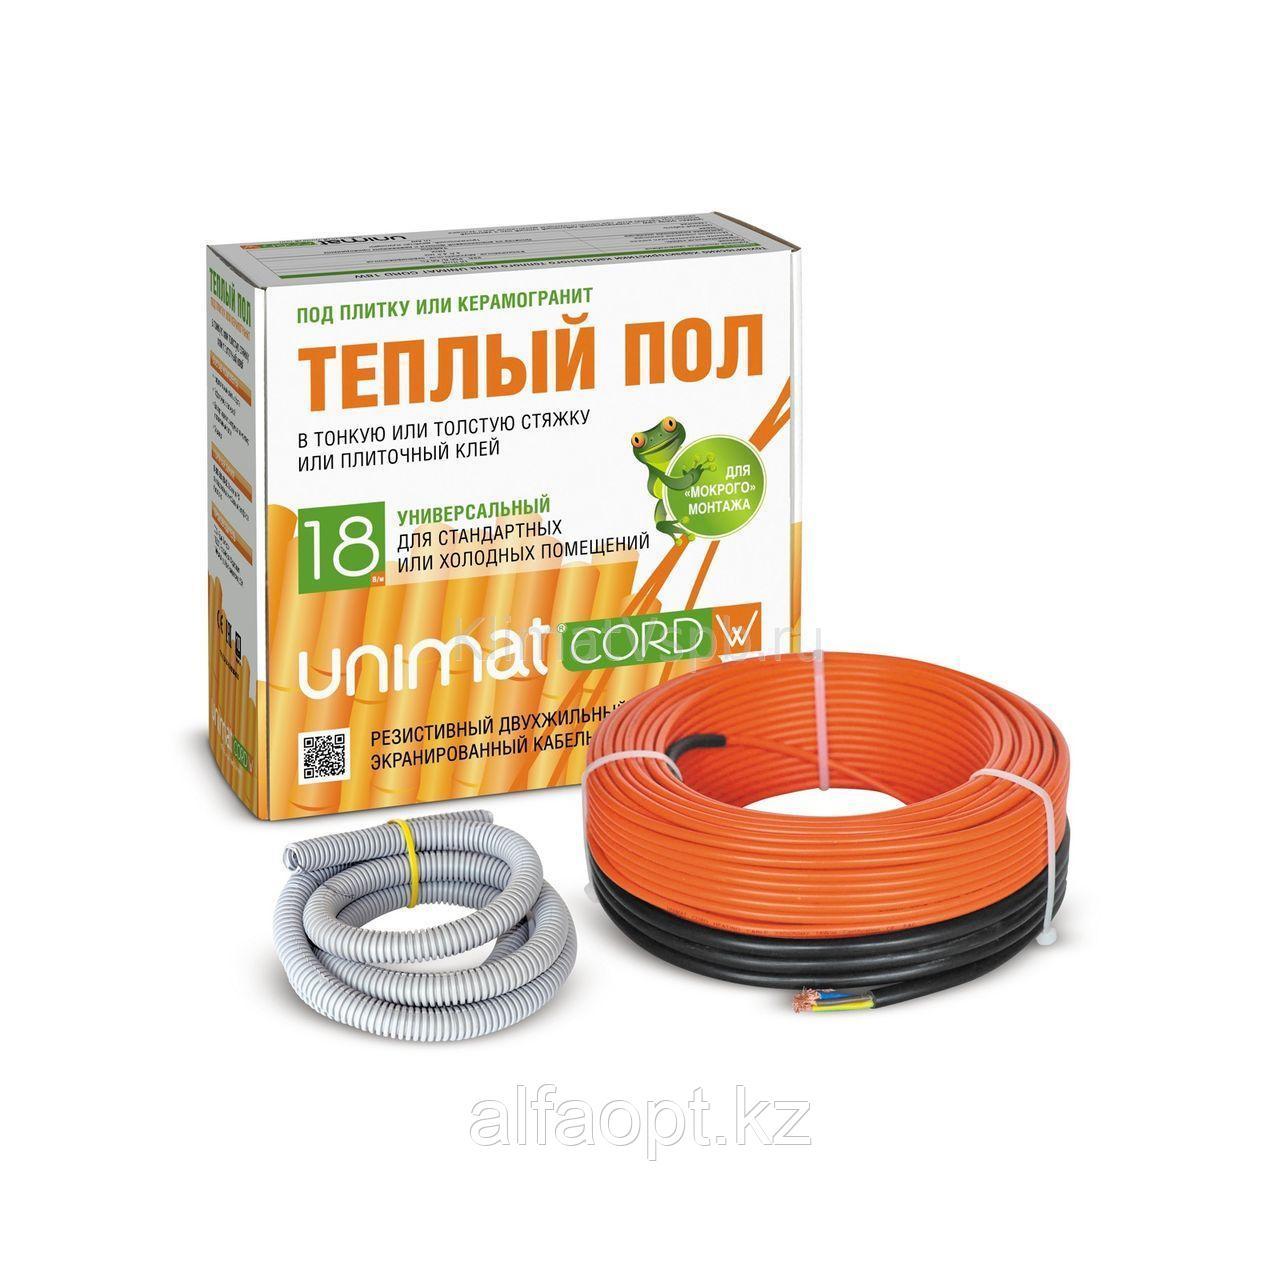 Комплект теплого пола Unimat CORD 18W-20